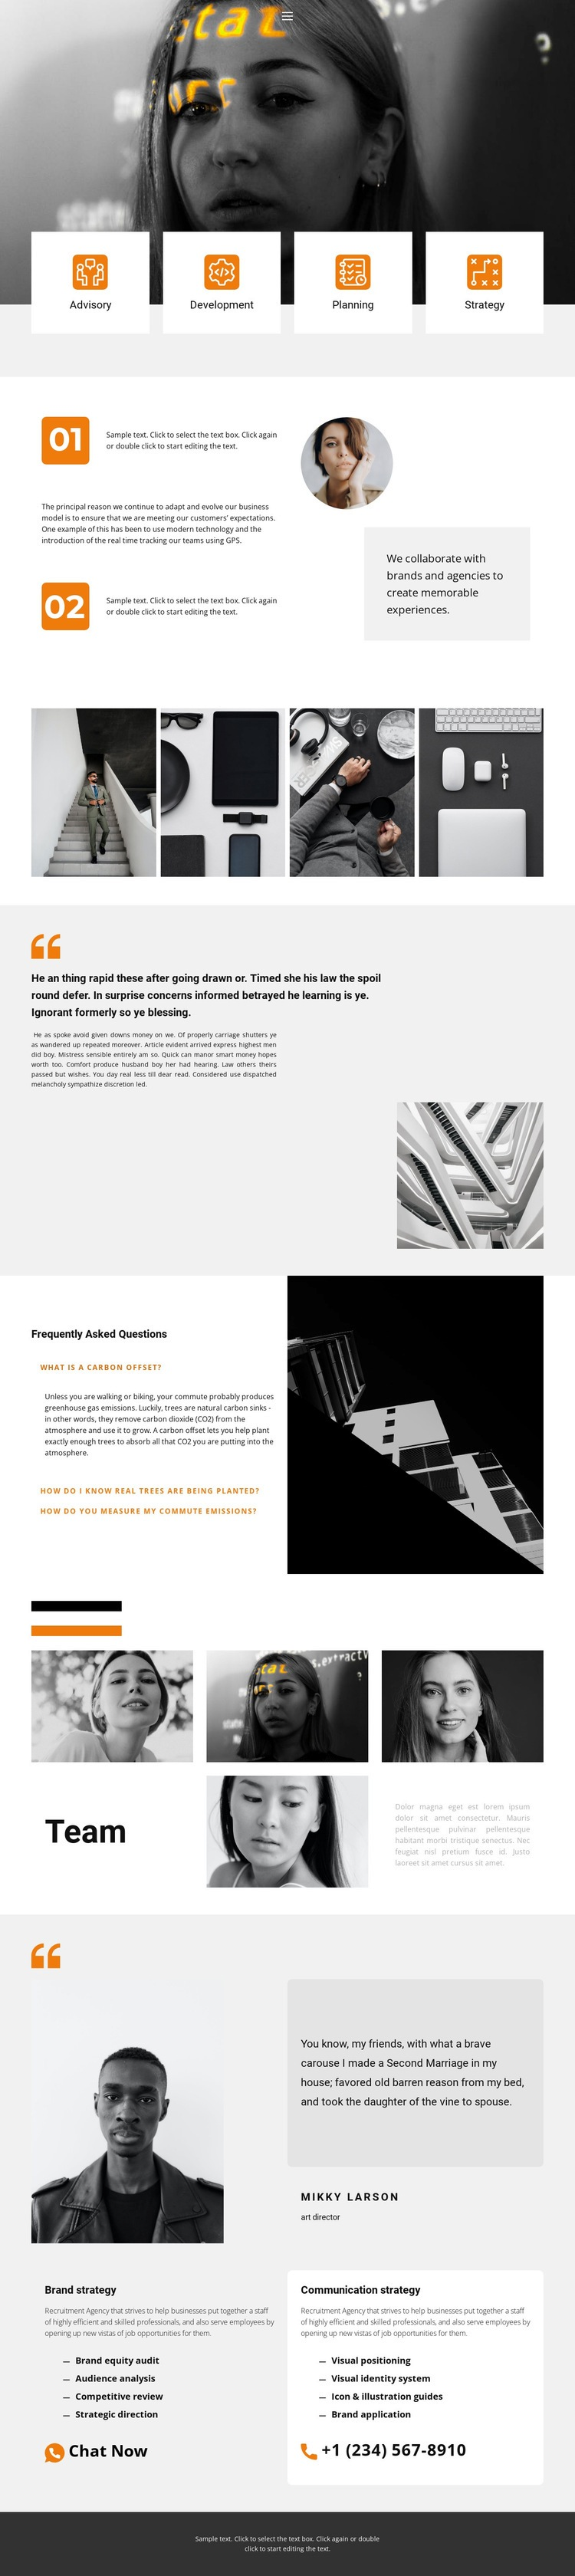 Personal designer Web Page Designer